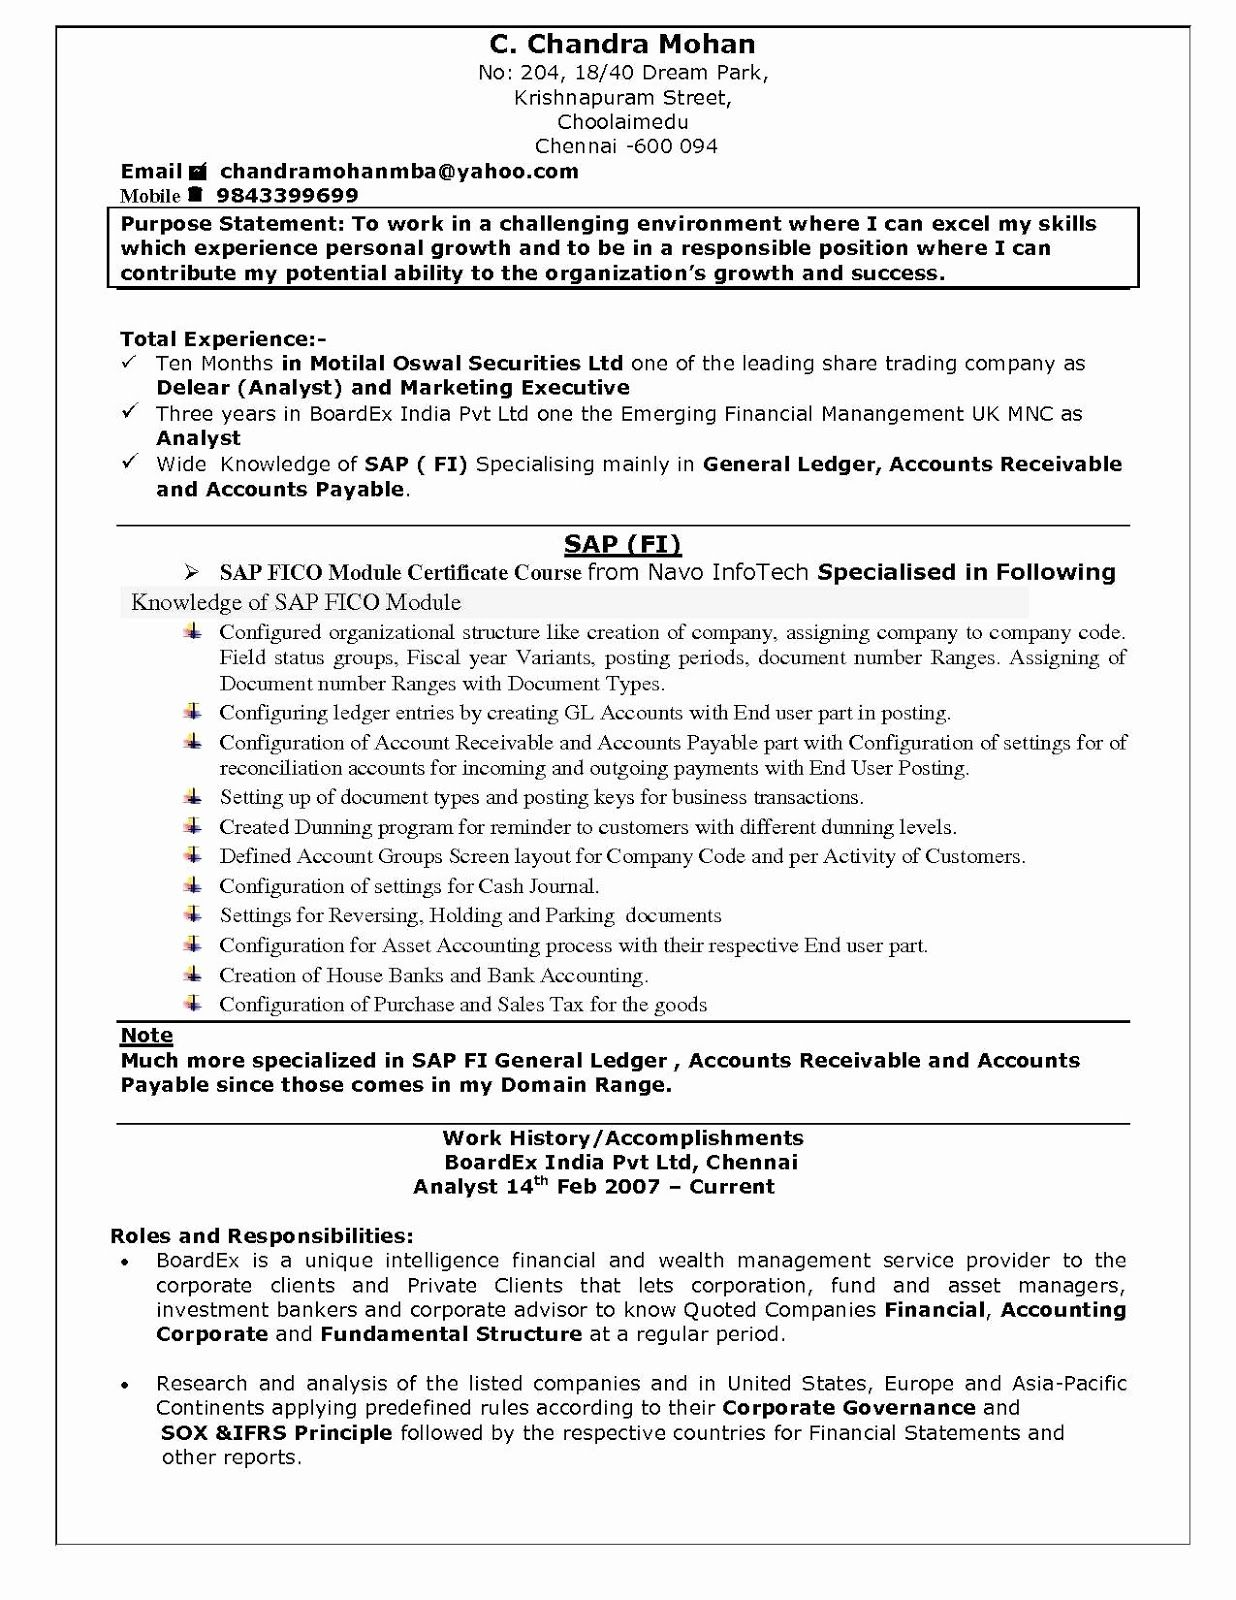 Accounts Payable Resume Format Accounts Payable Resume Format In India Accounts Payable Resume Format For B Best Resume Template Resume Format Resume Templates